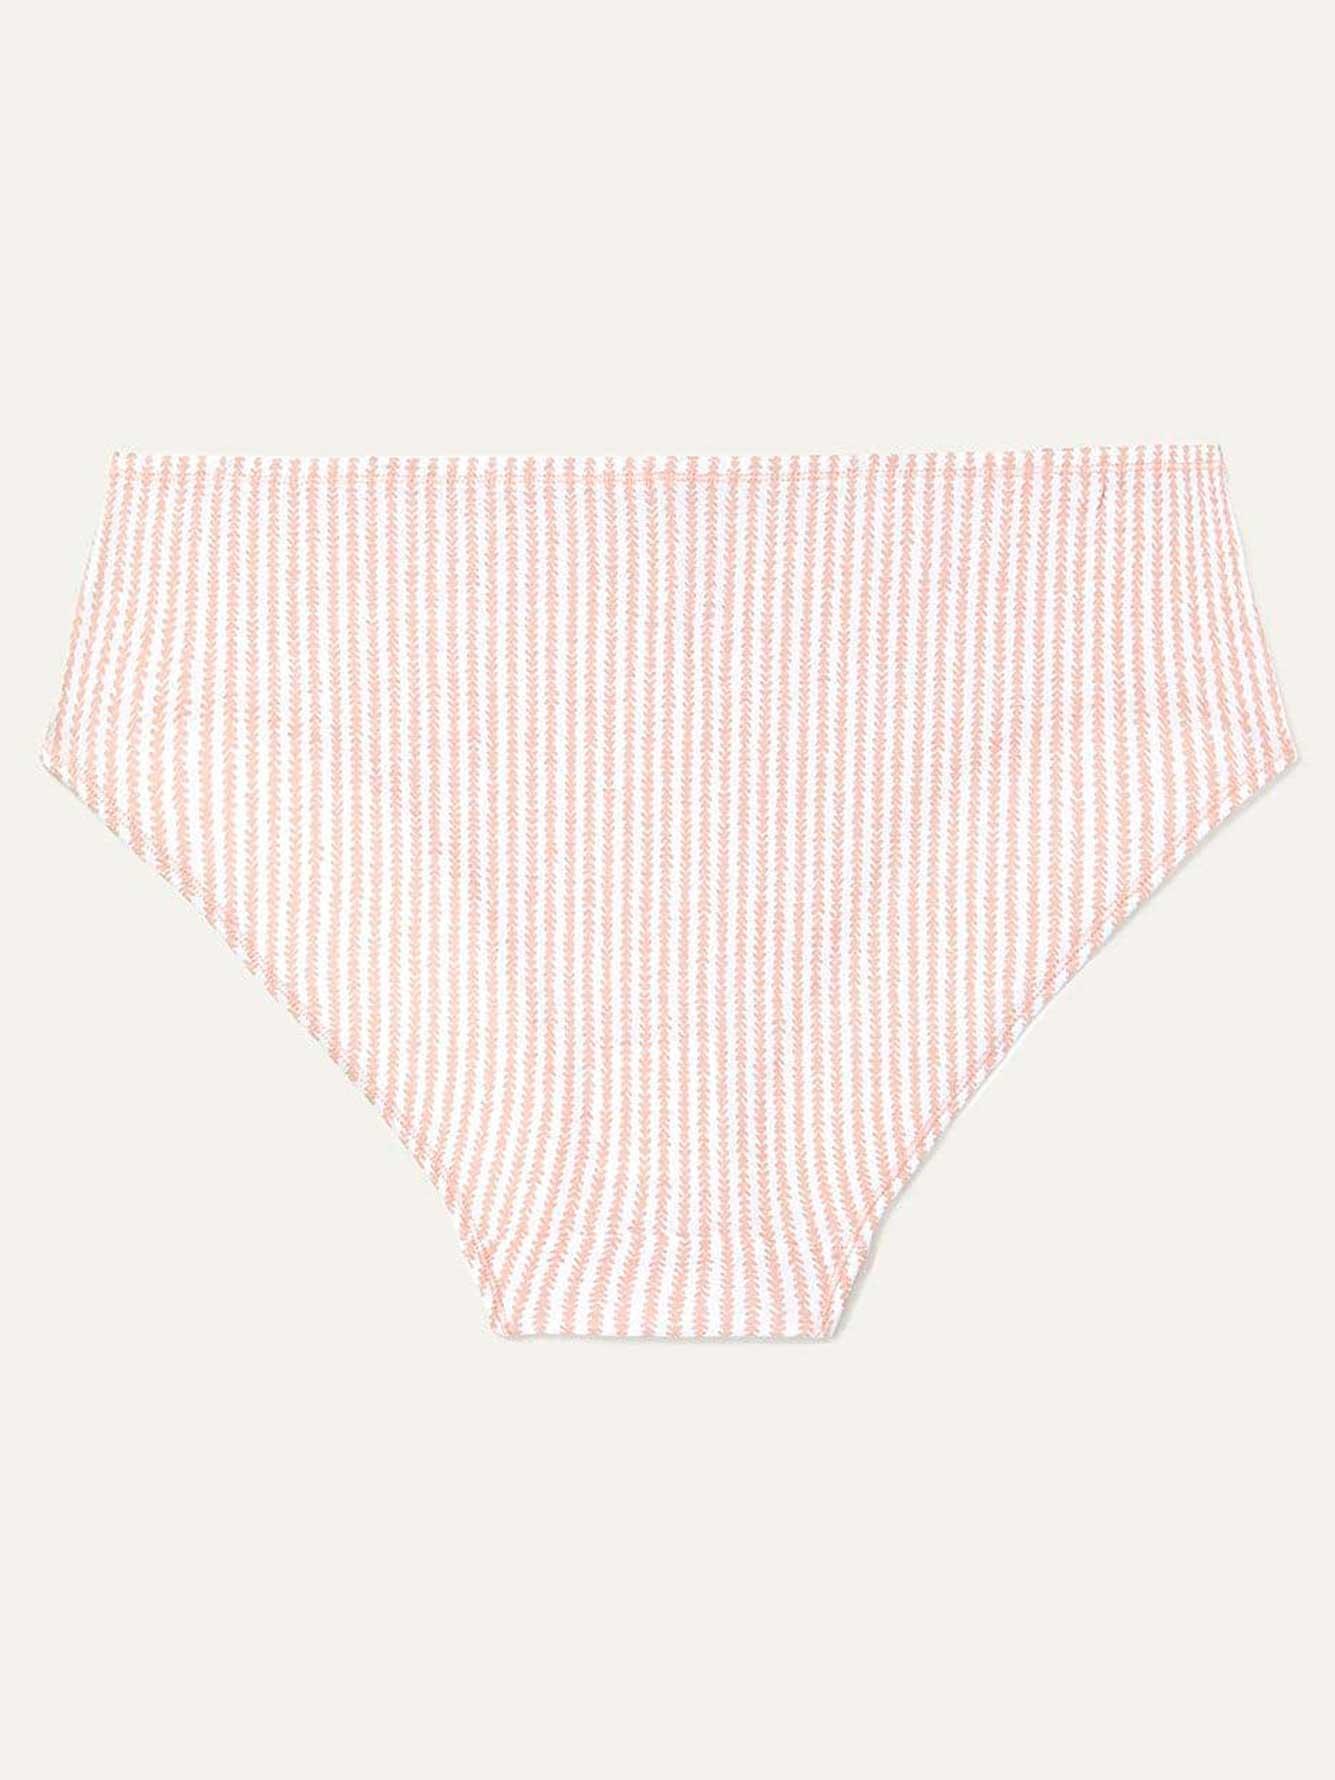 733ff4836f4f Printed Cotton Hipster Panty - ti Voglio | Penningtons